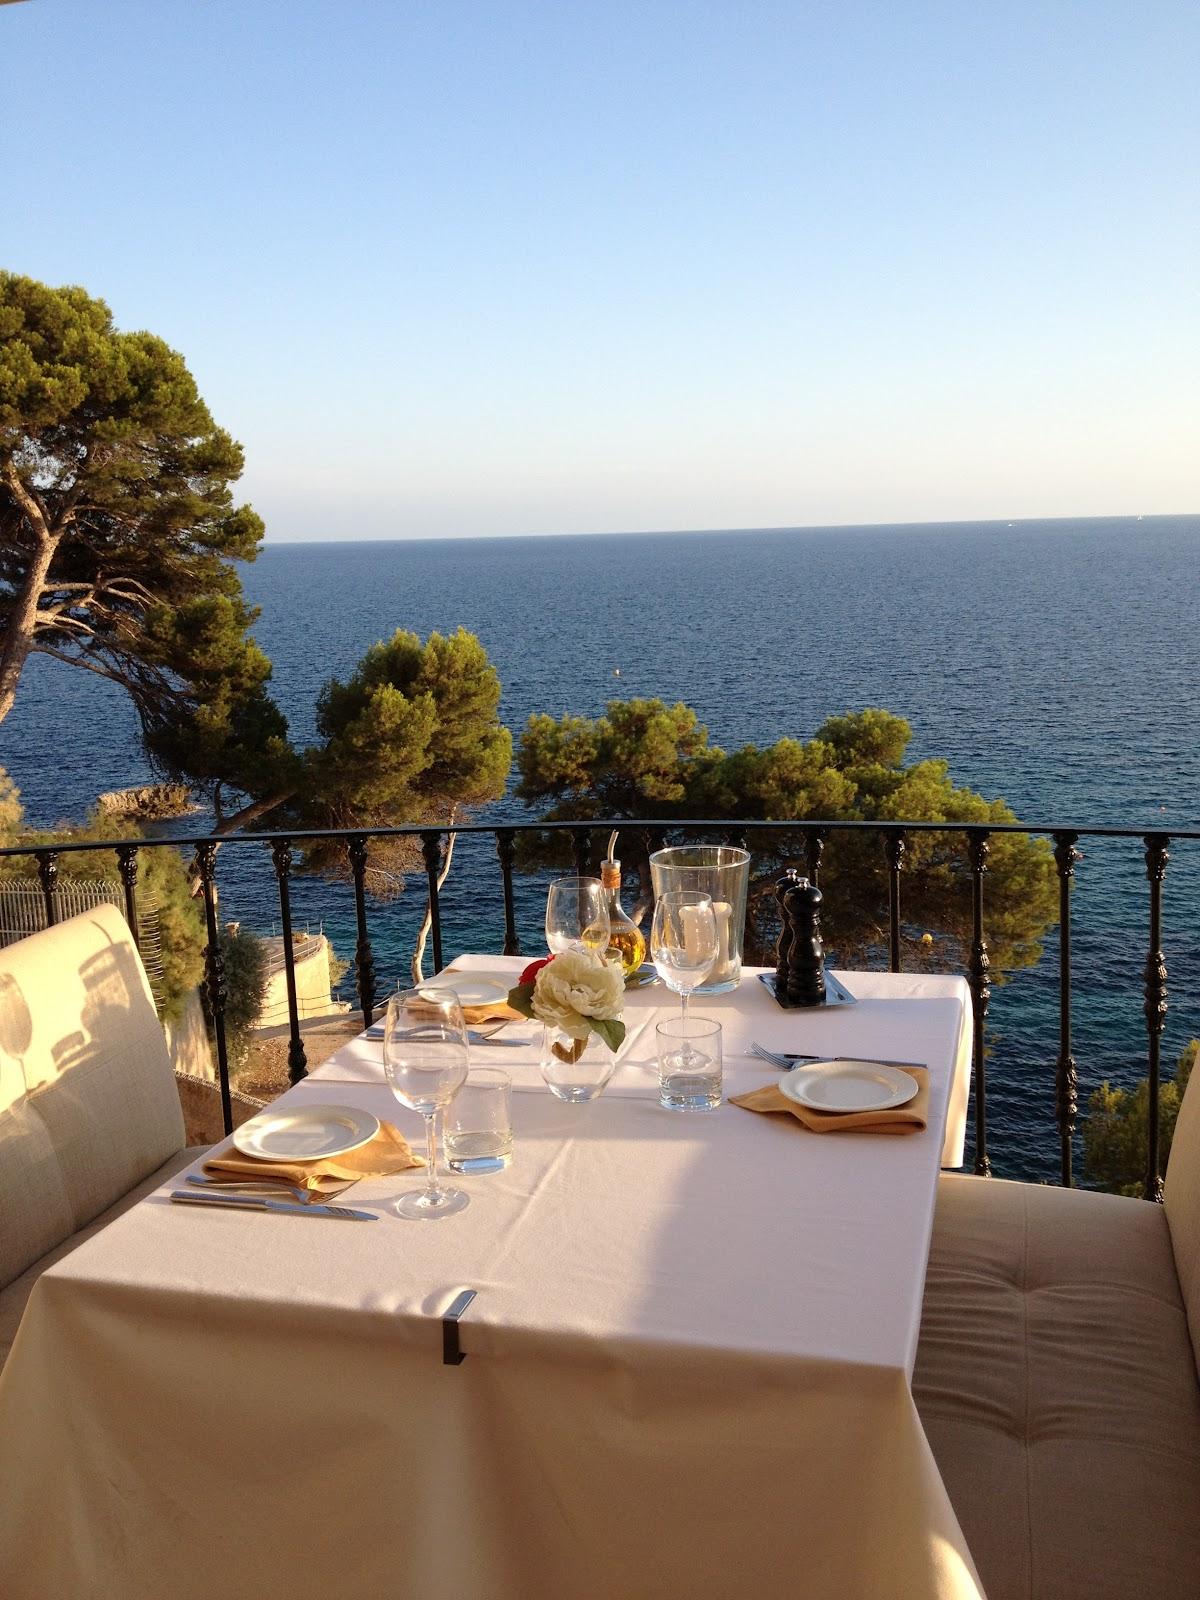 Marie s travel diary top 10 things to do on in palma mallorca - Zara palma de mallorca ...